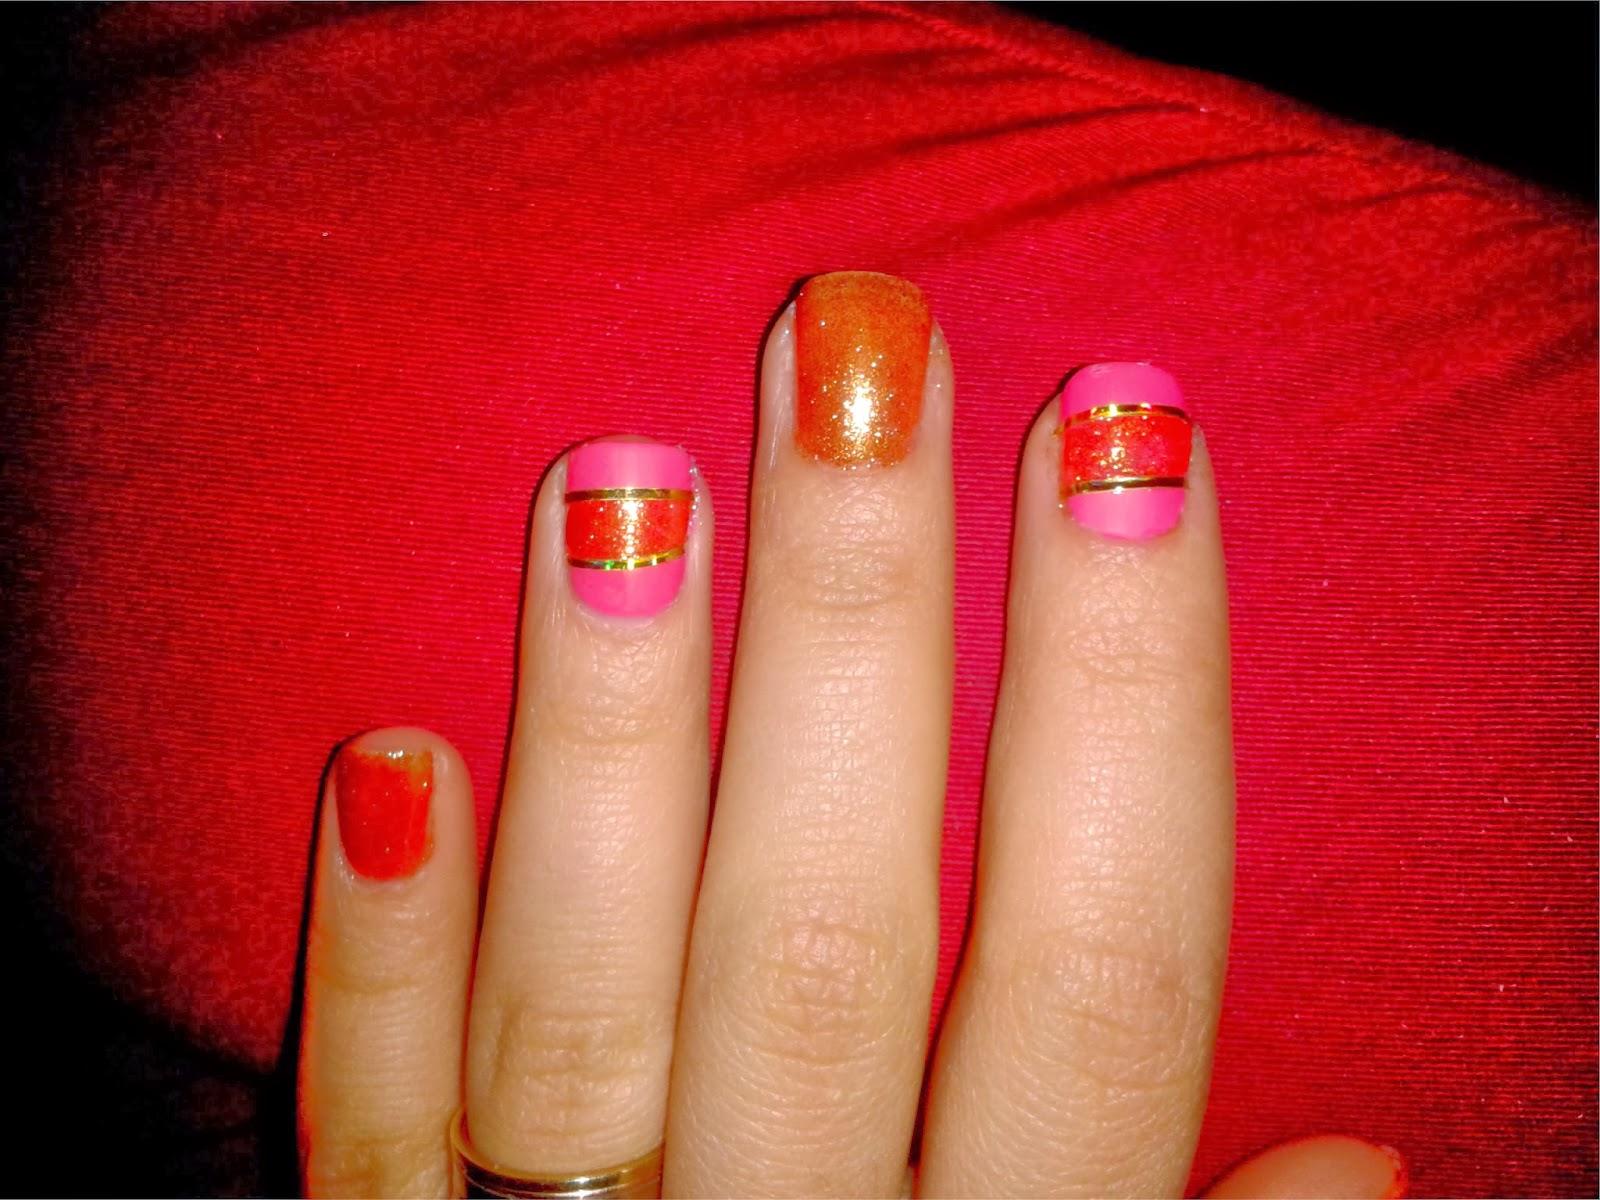 Gold diva nails taitzel beauty fashion and lifestyle - Diva nails and beauty ...